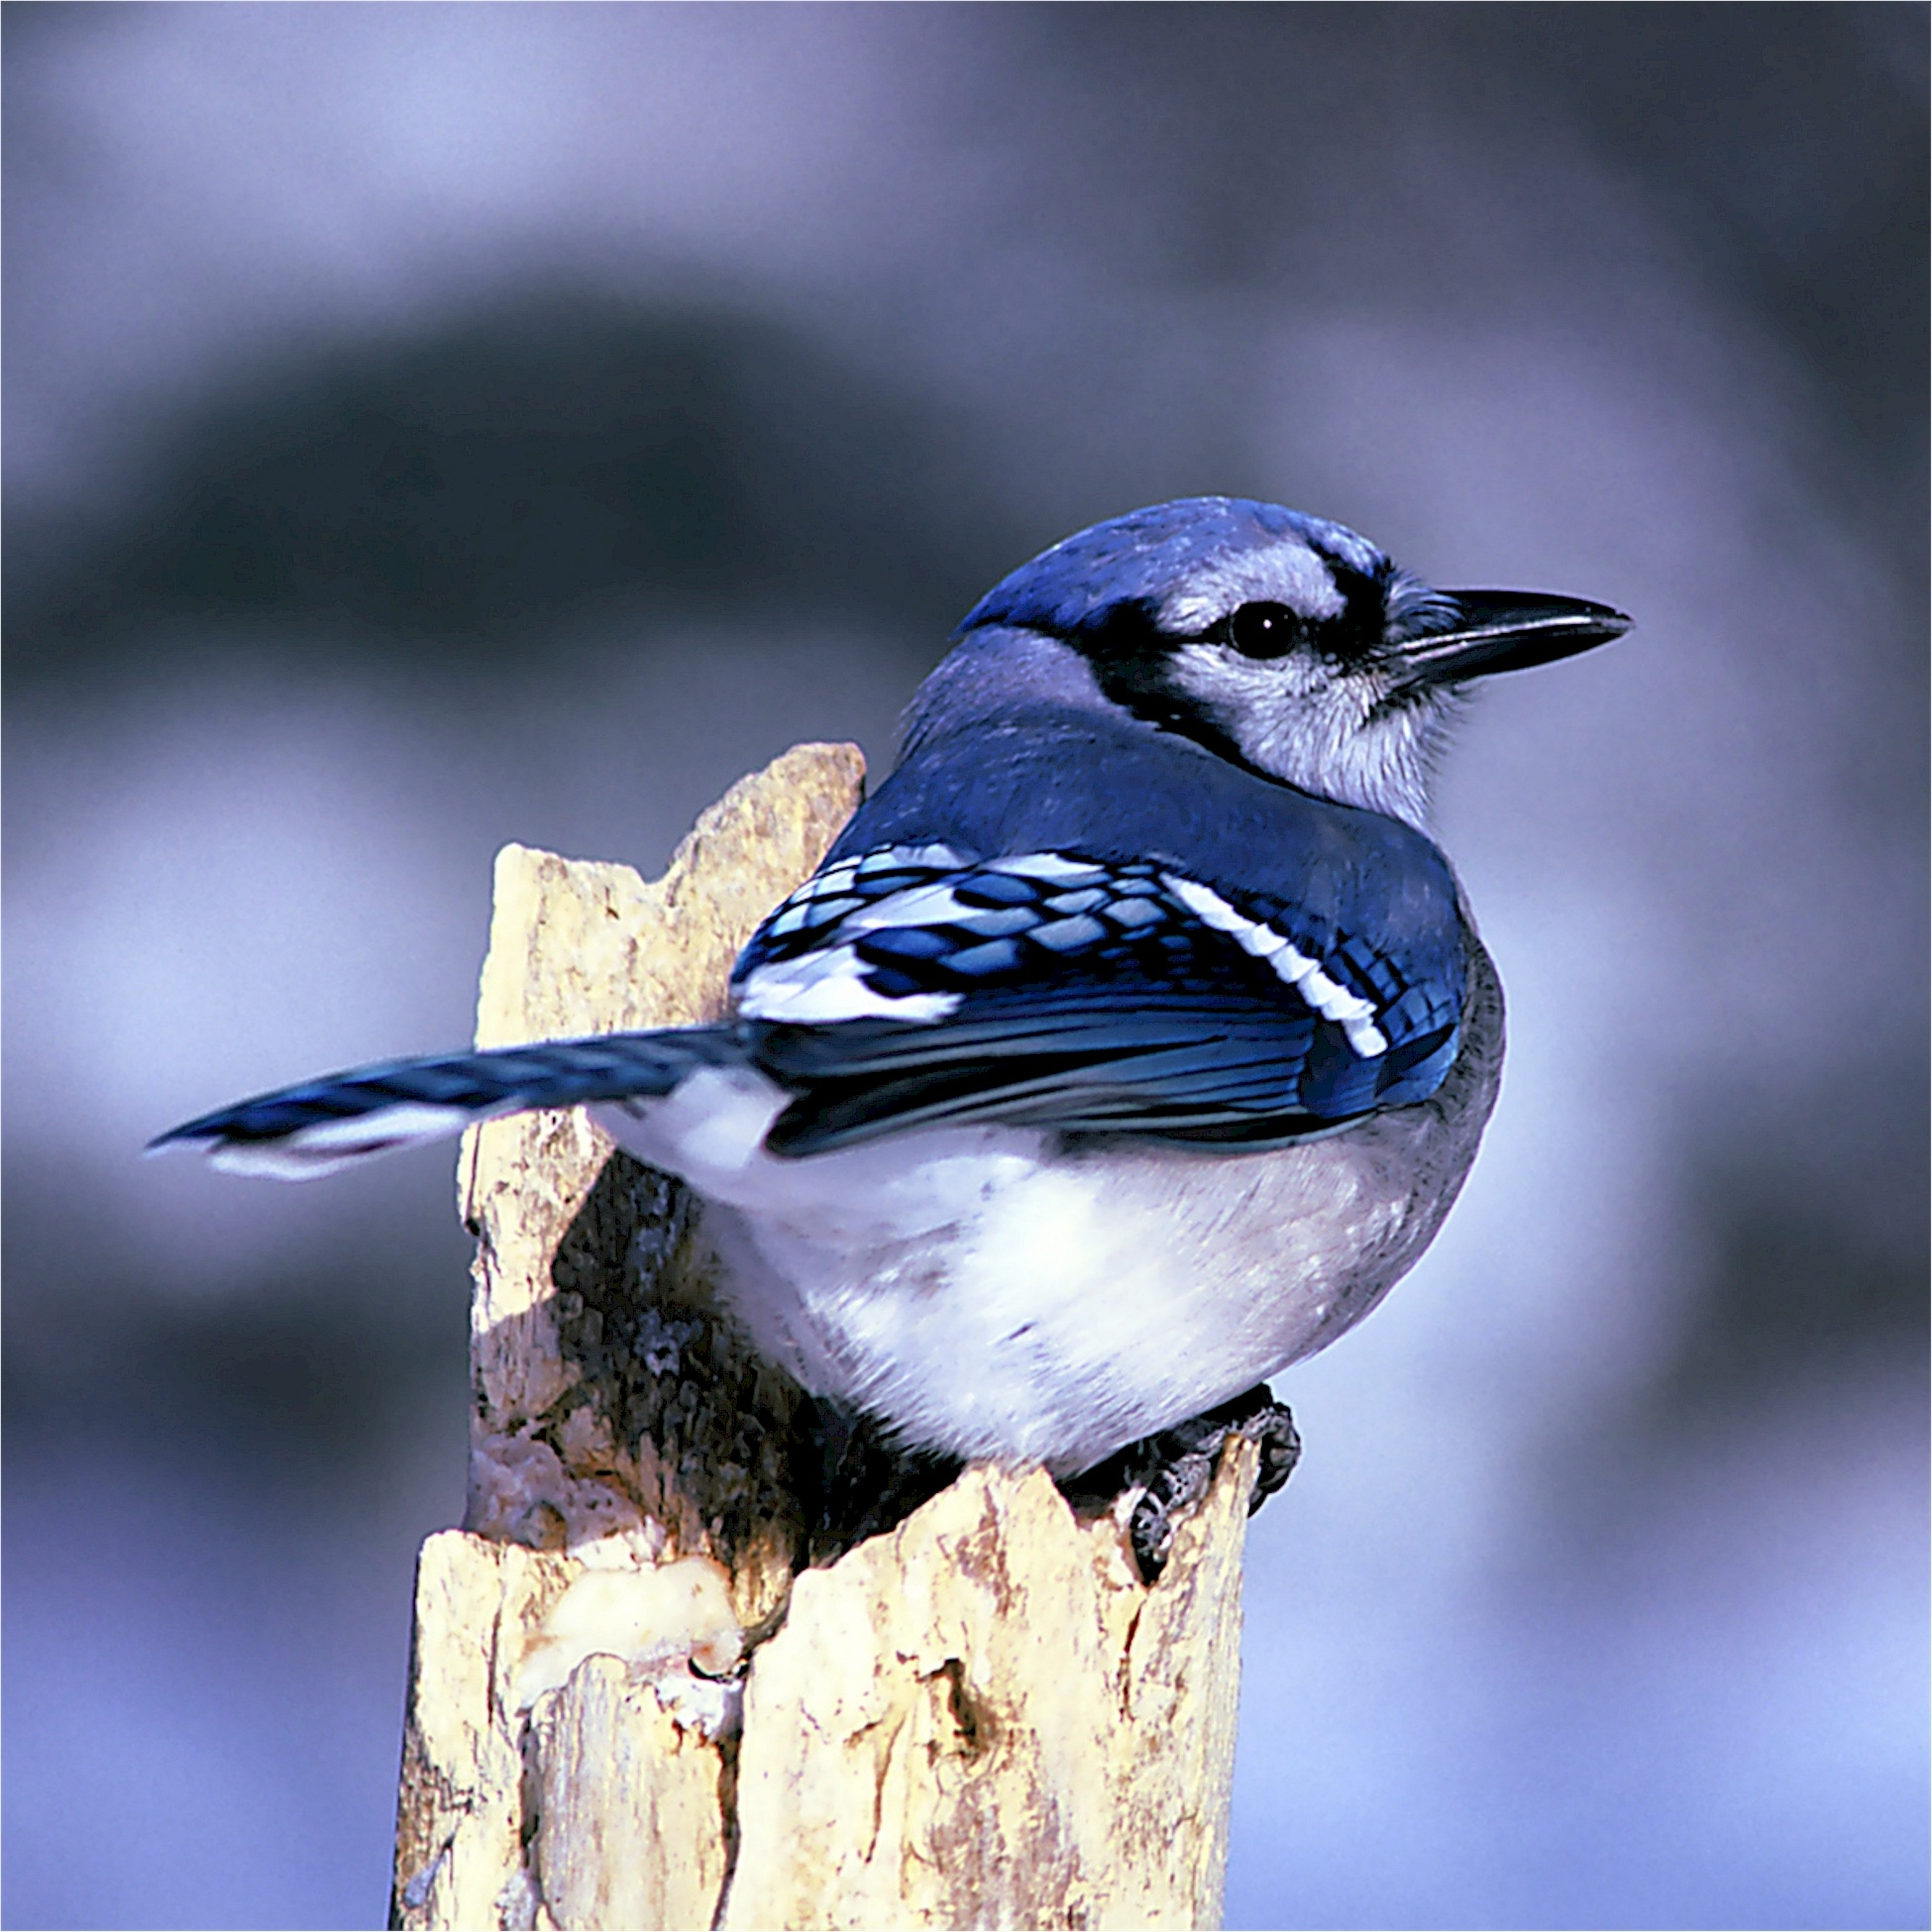 Blue Jay, Animal, Bird, Blue, Jay, HQ Photo